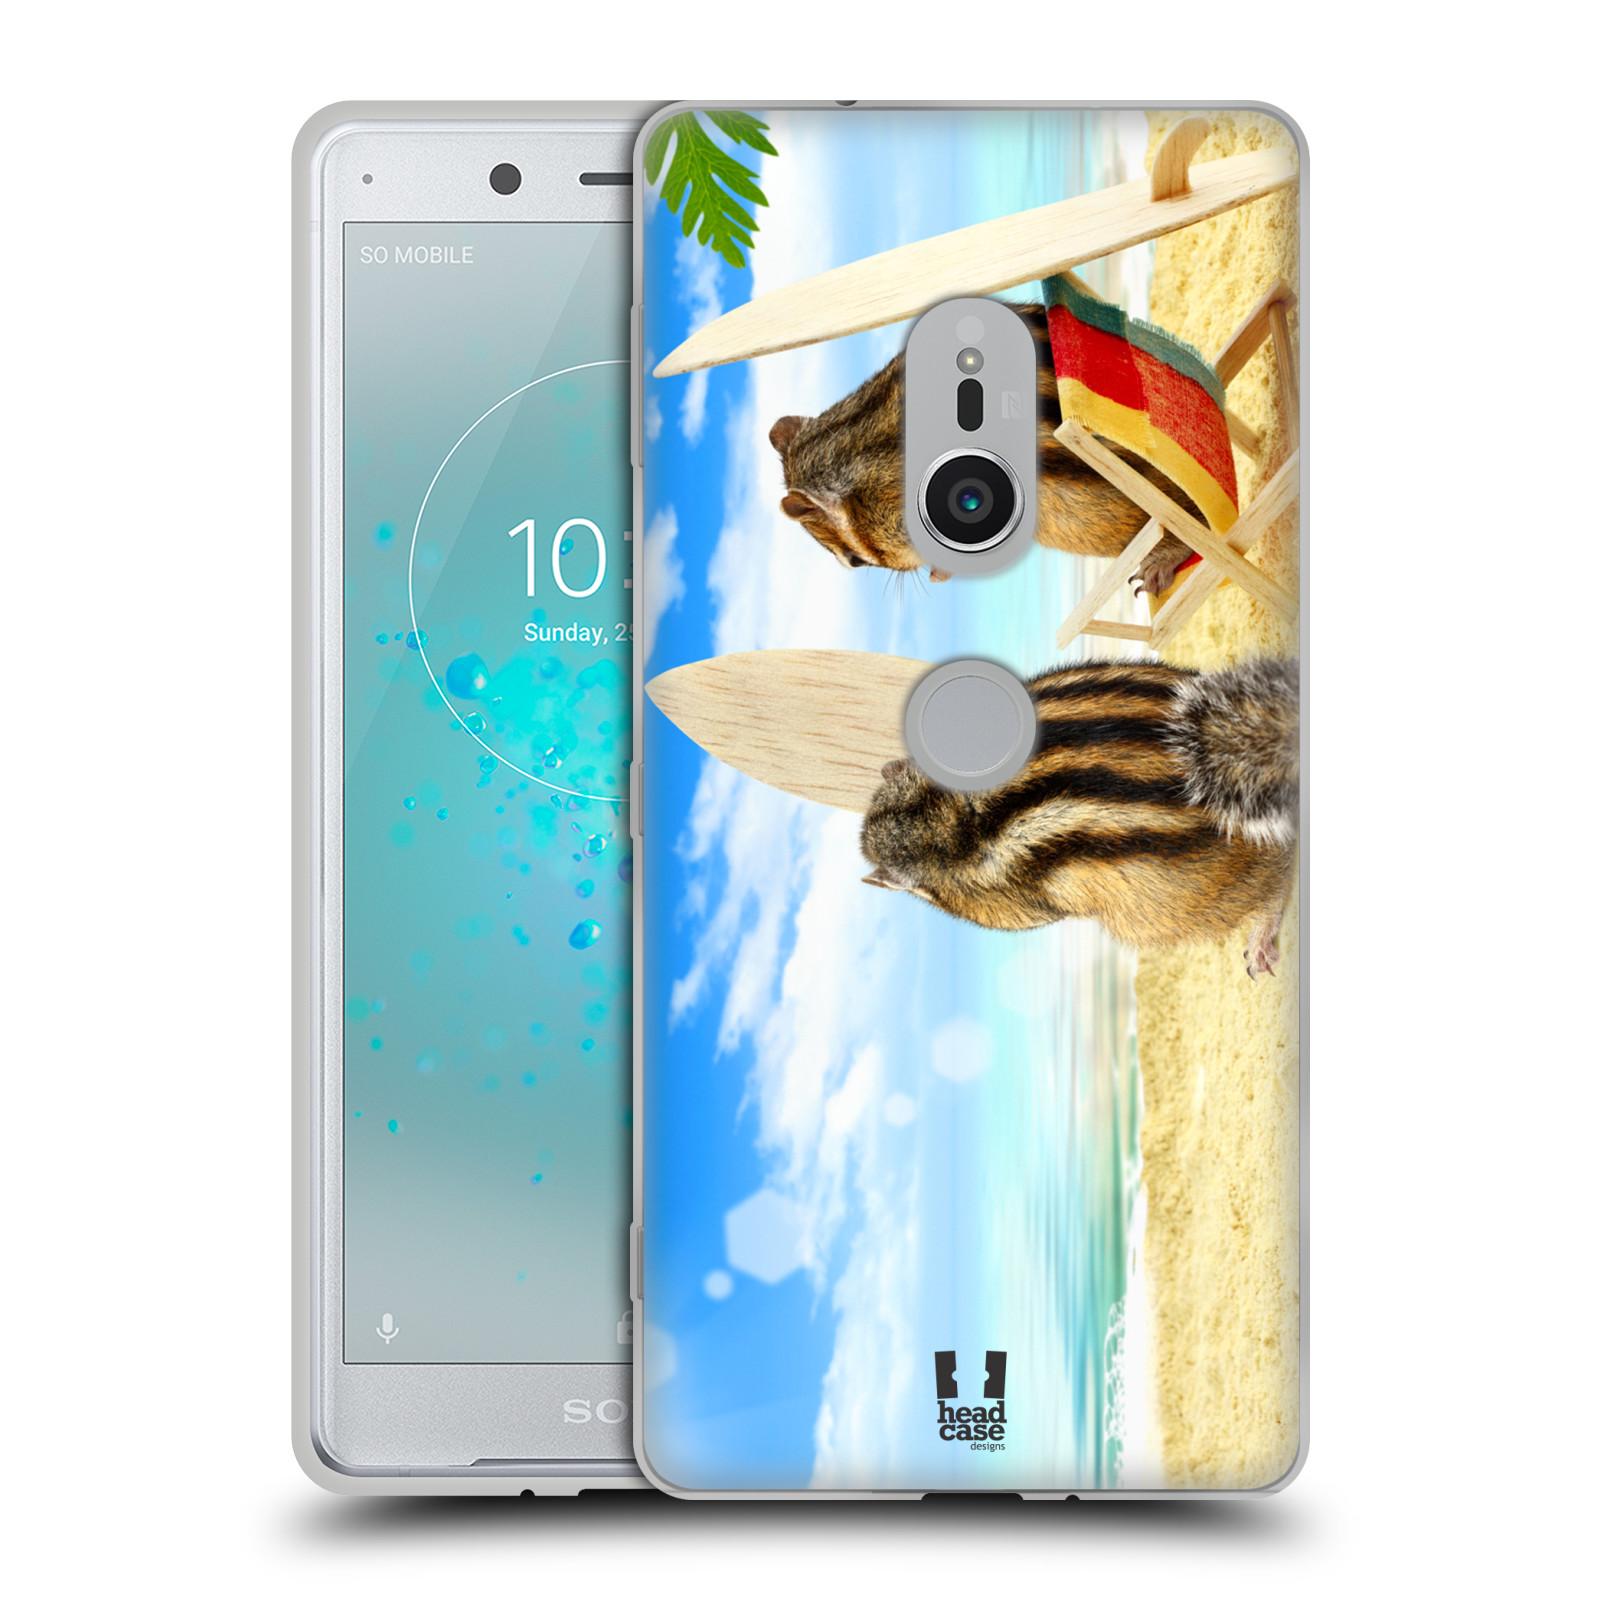 HEAD CASE silikonový obal na mobil Sony Xperia XZ2 vzor Legrační zvířátka veverky surfaři u moře